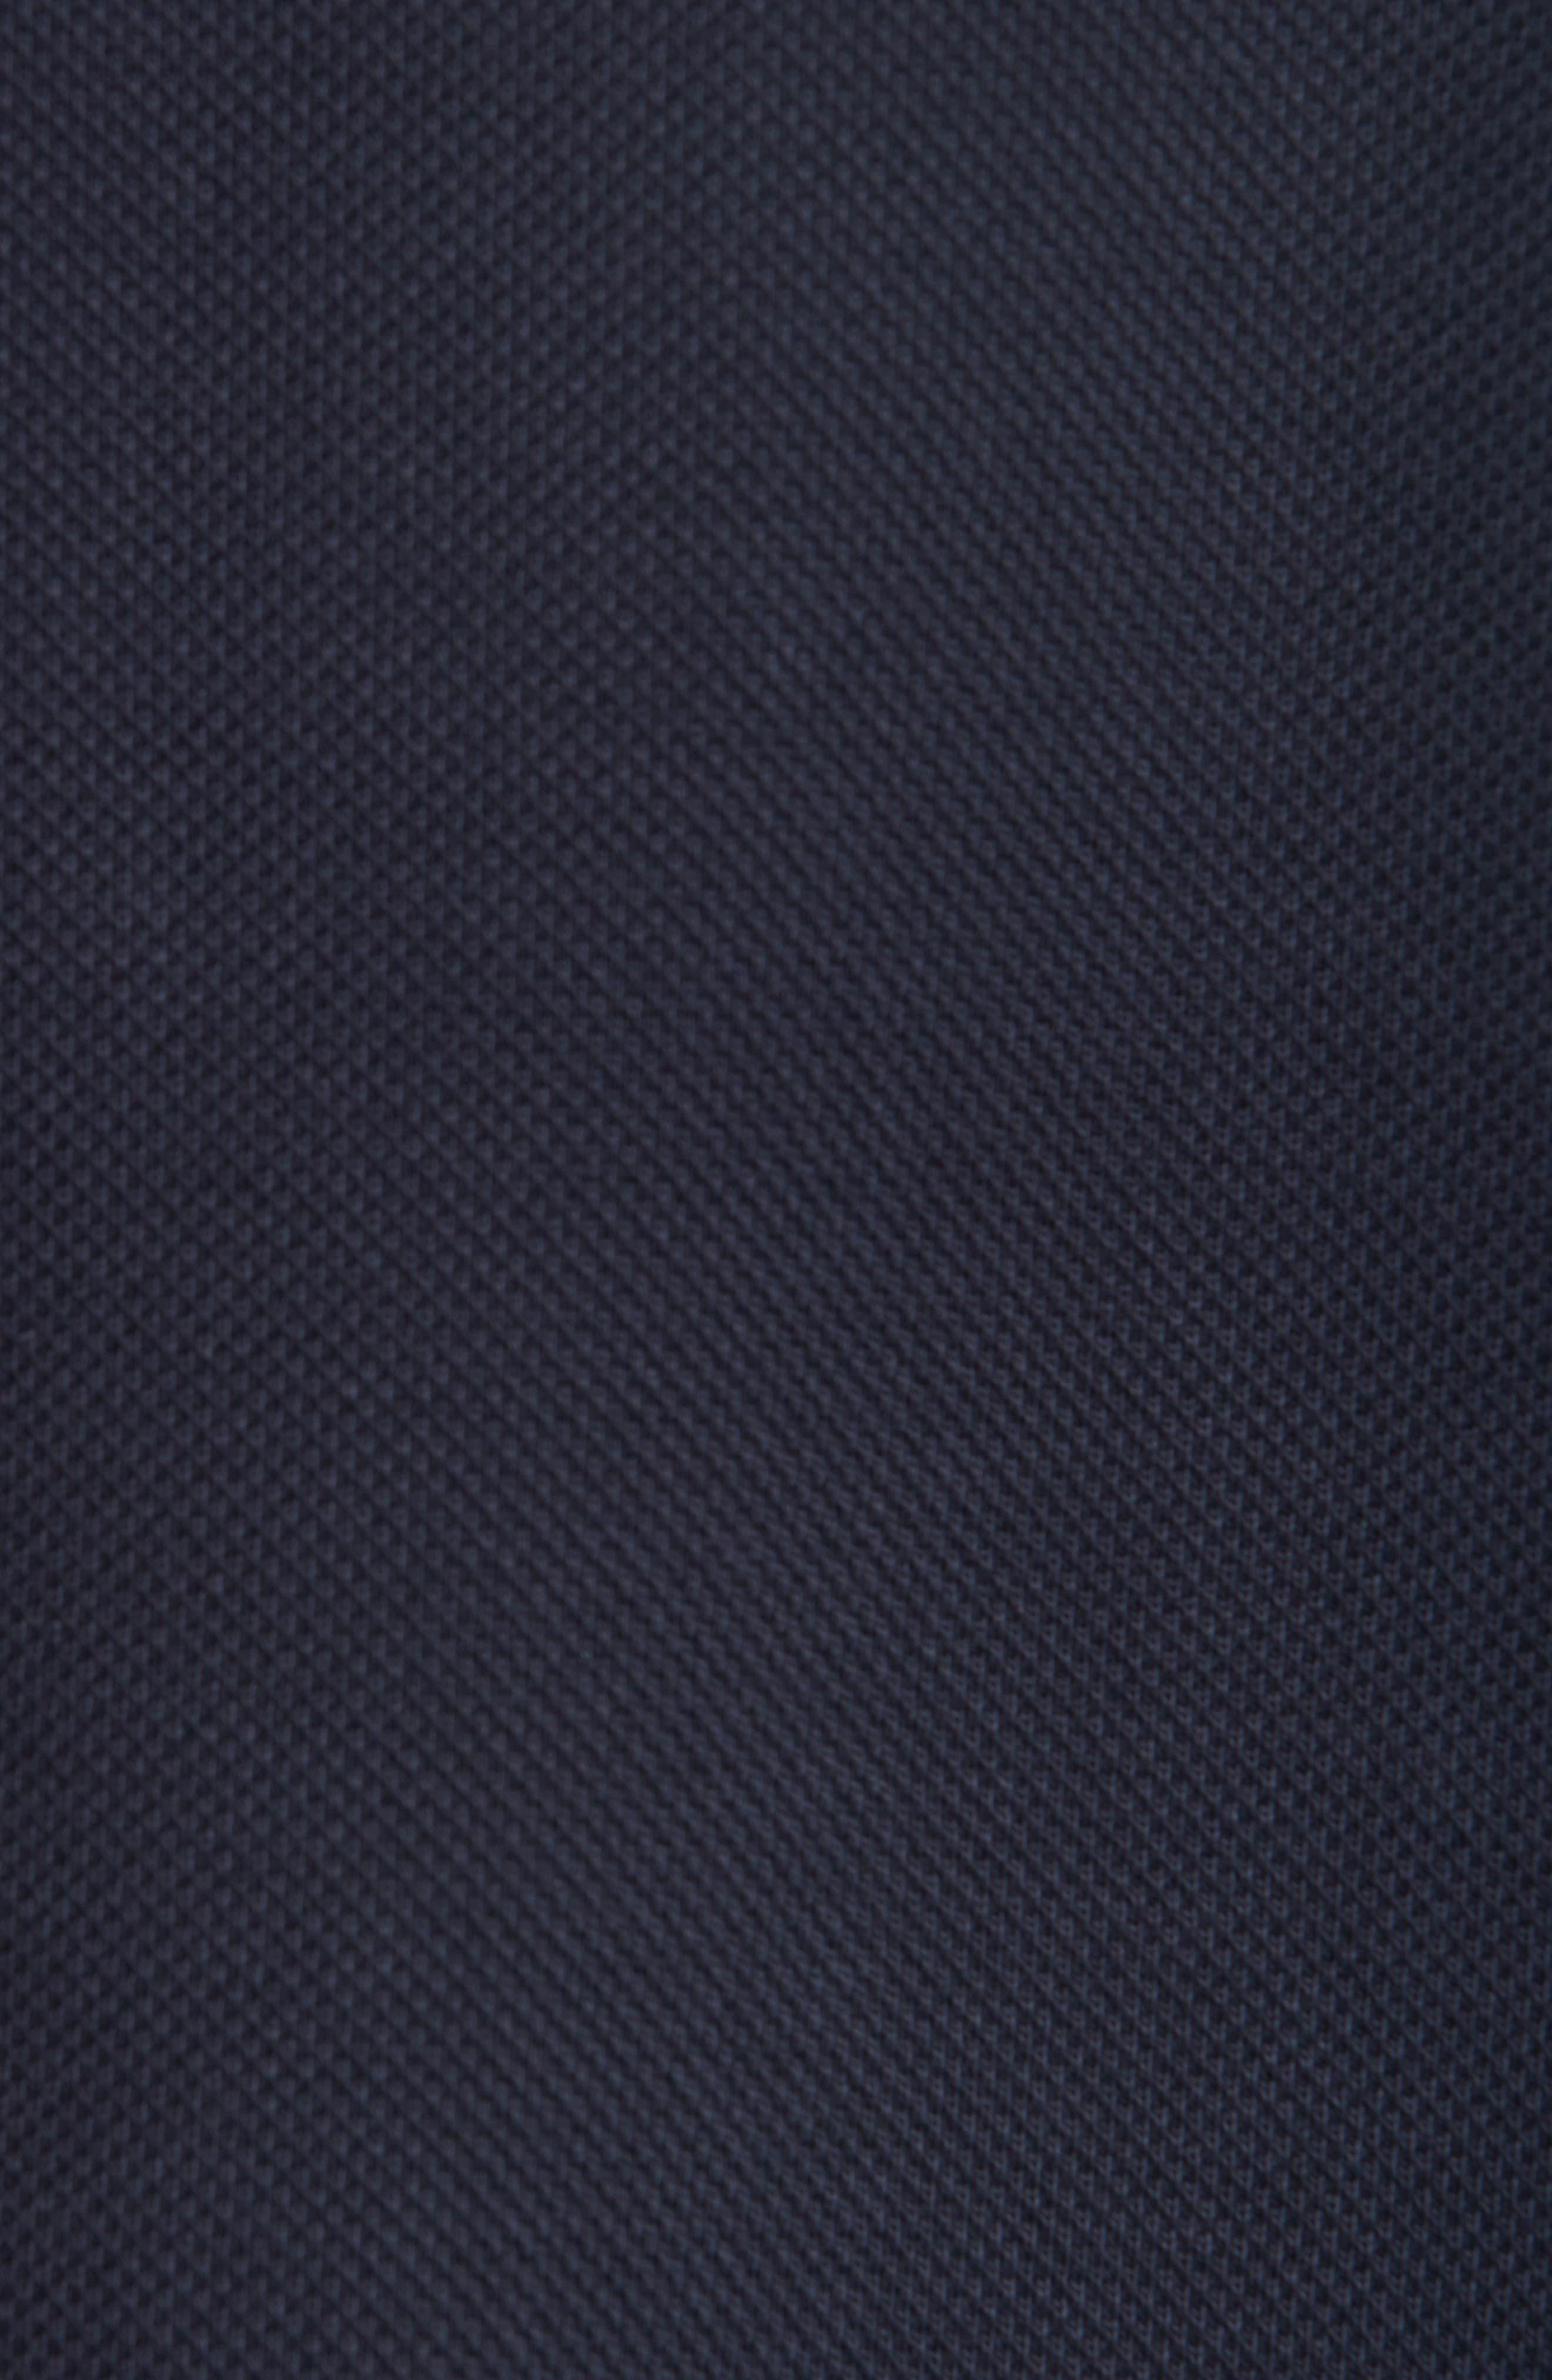 Thaeis Piqué Polo,                             Alternate thumbnail 5, color,                             410